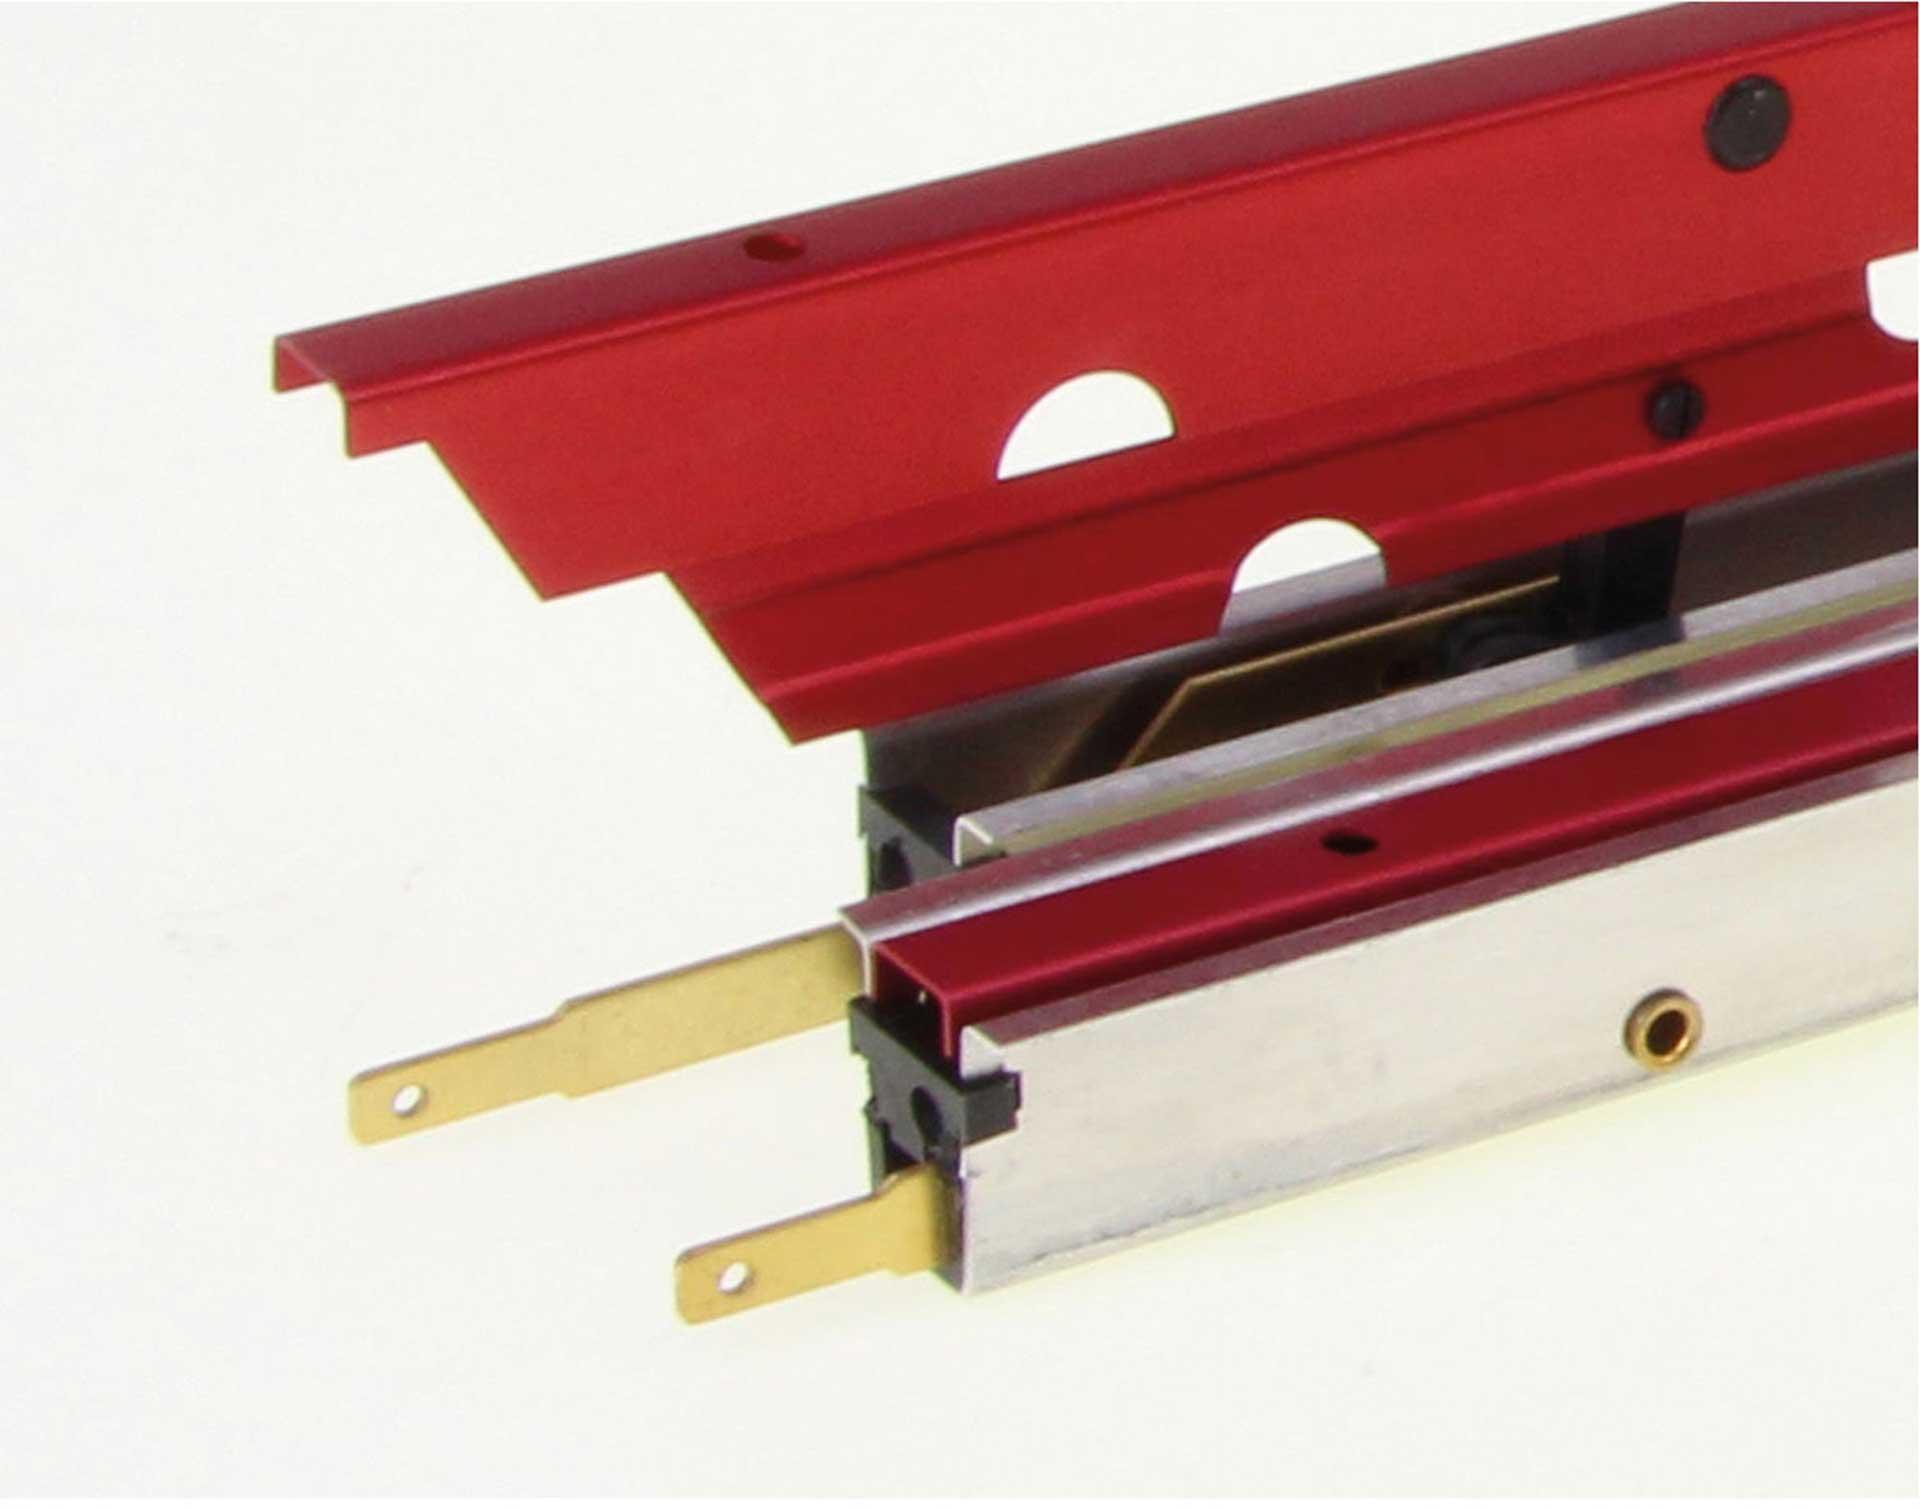 MODELLBAU LINDINGER FLAPS 37CM/16MM RED ANODISED ALUMINIUM DOUBLE LOCKED, OUTSIDE HINGED, SPOILERS